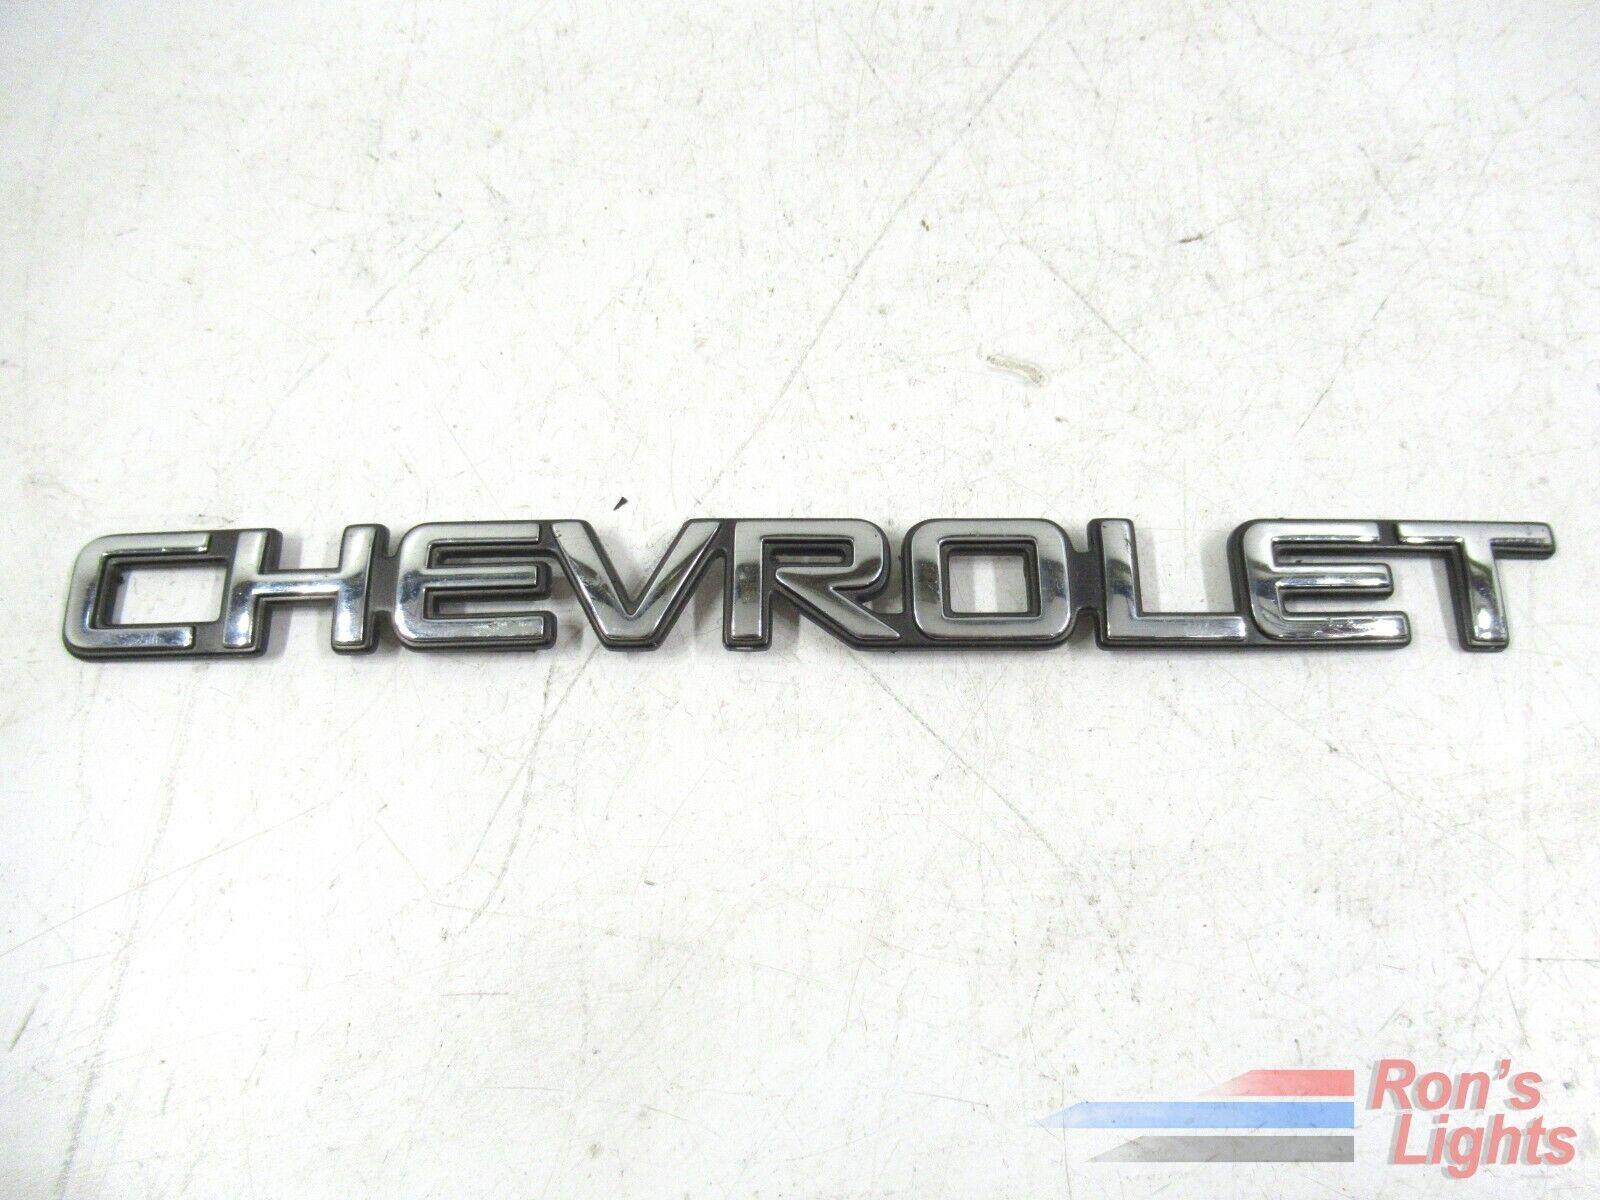 2x Allison Transmission Duramax Hood Emblem For Gm Chevrolet Silverado 1000